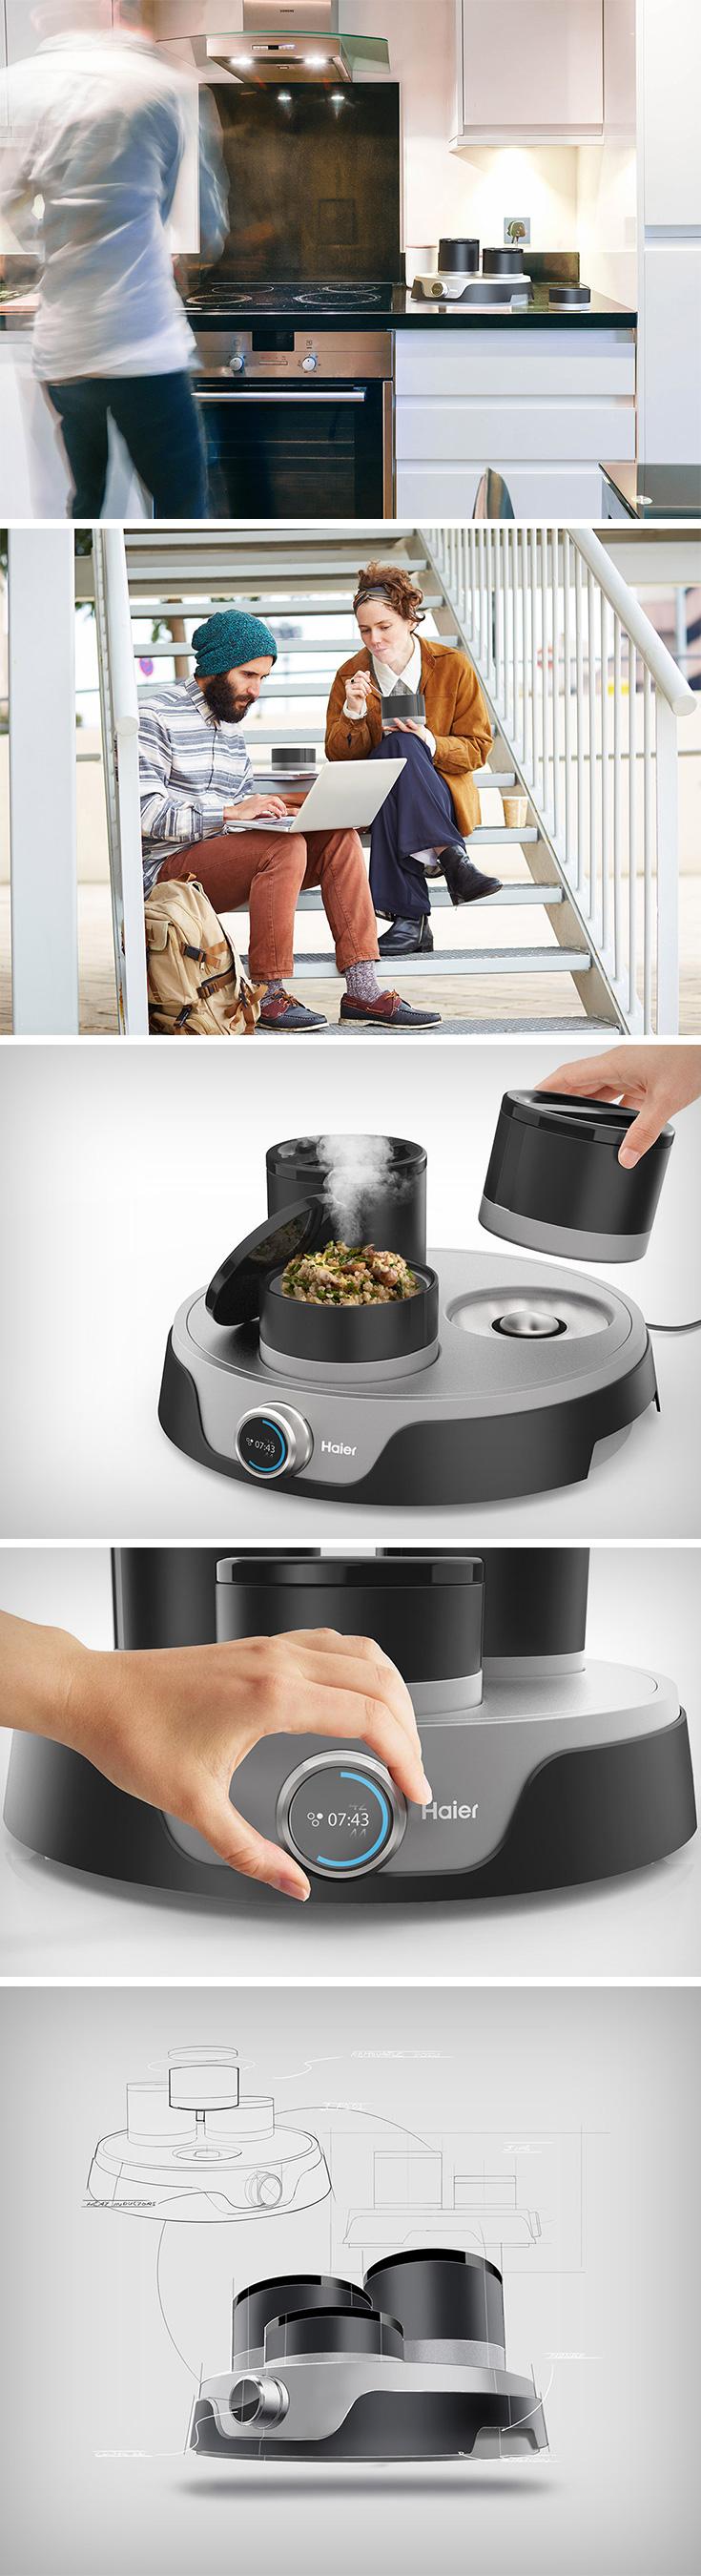 electrolux maxisense halo induction cooktop a good design